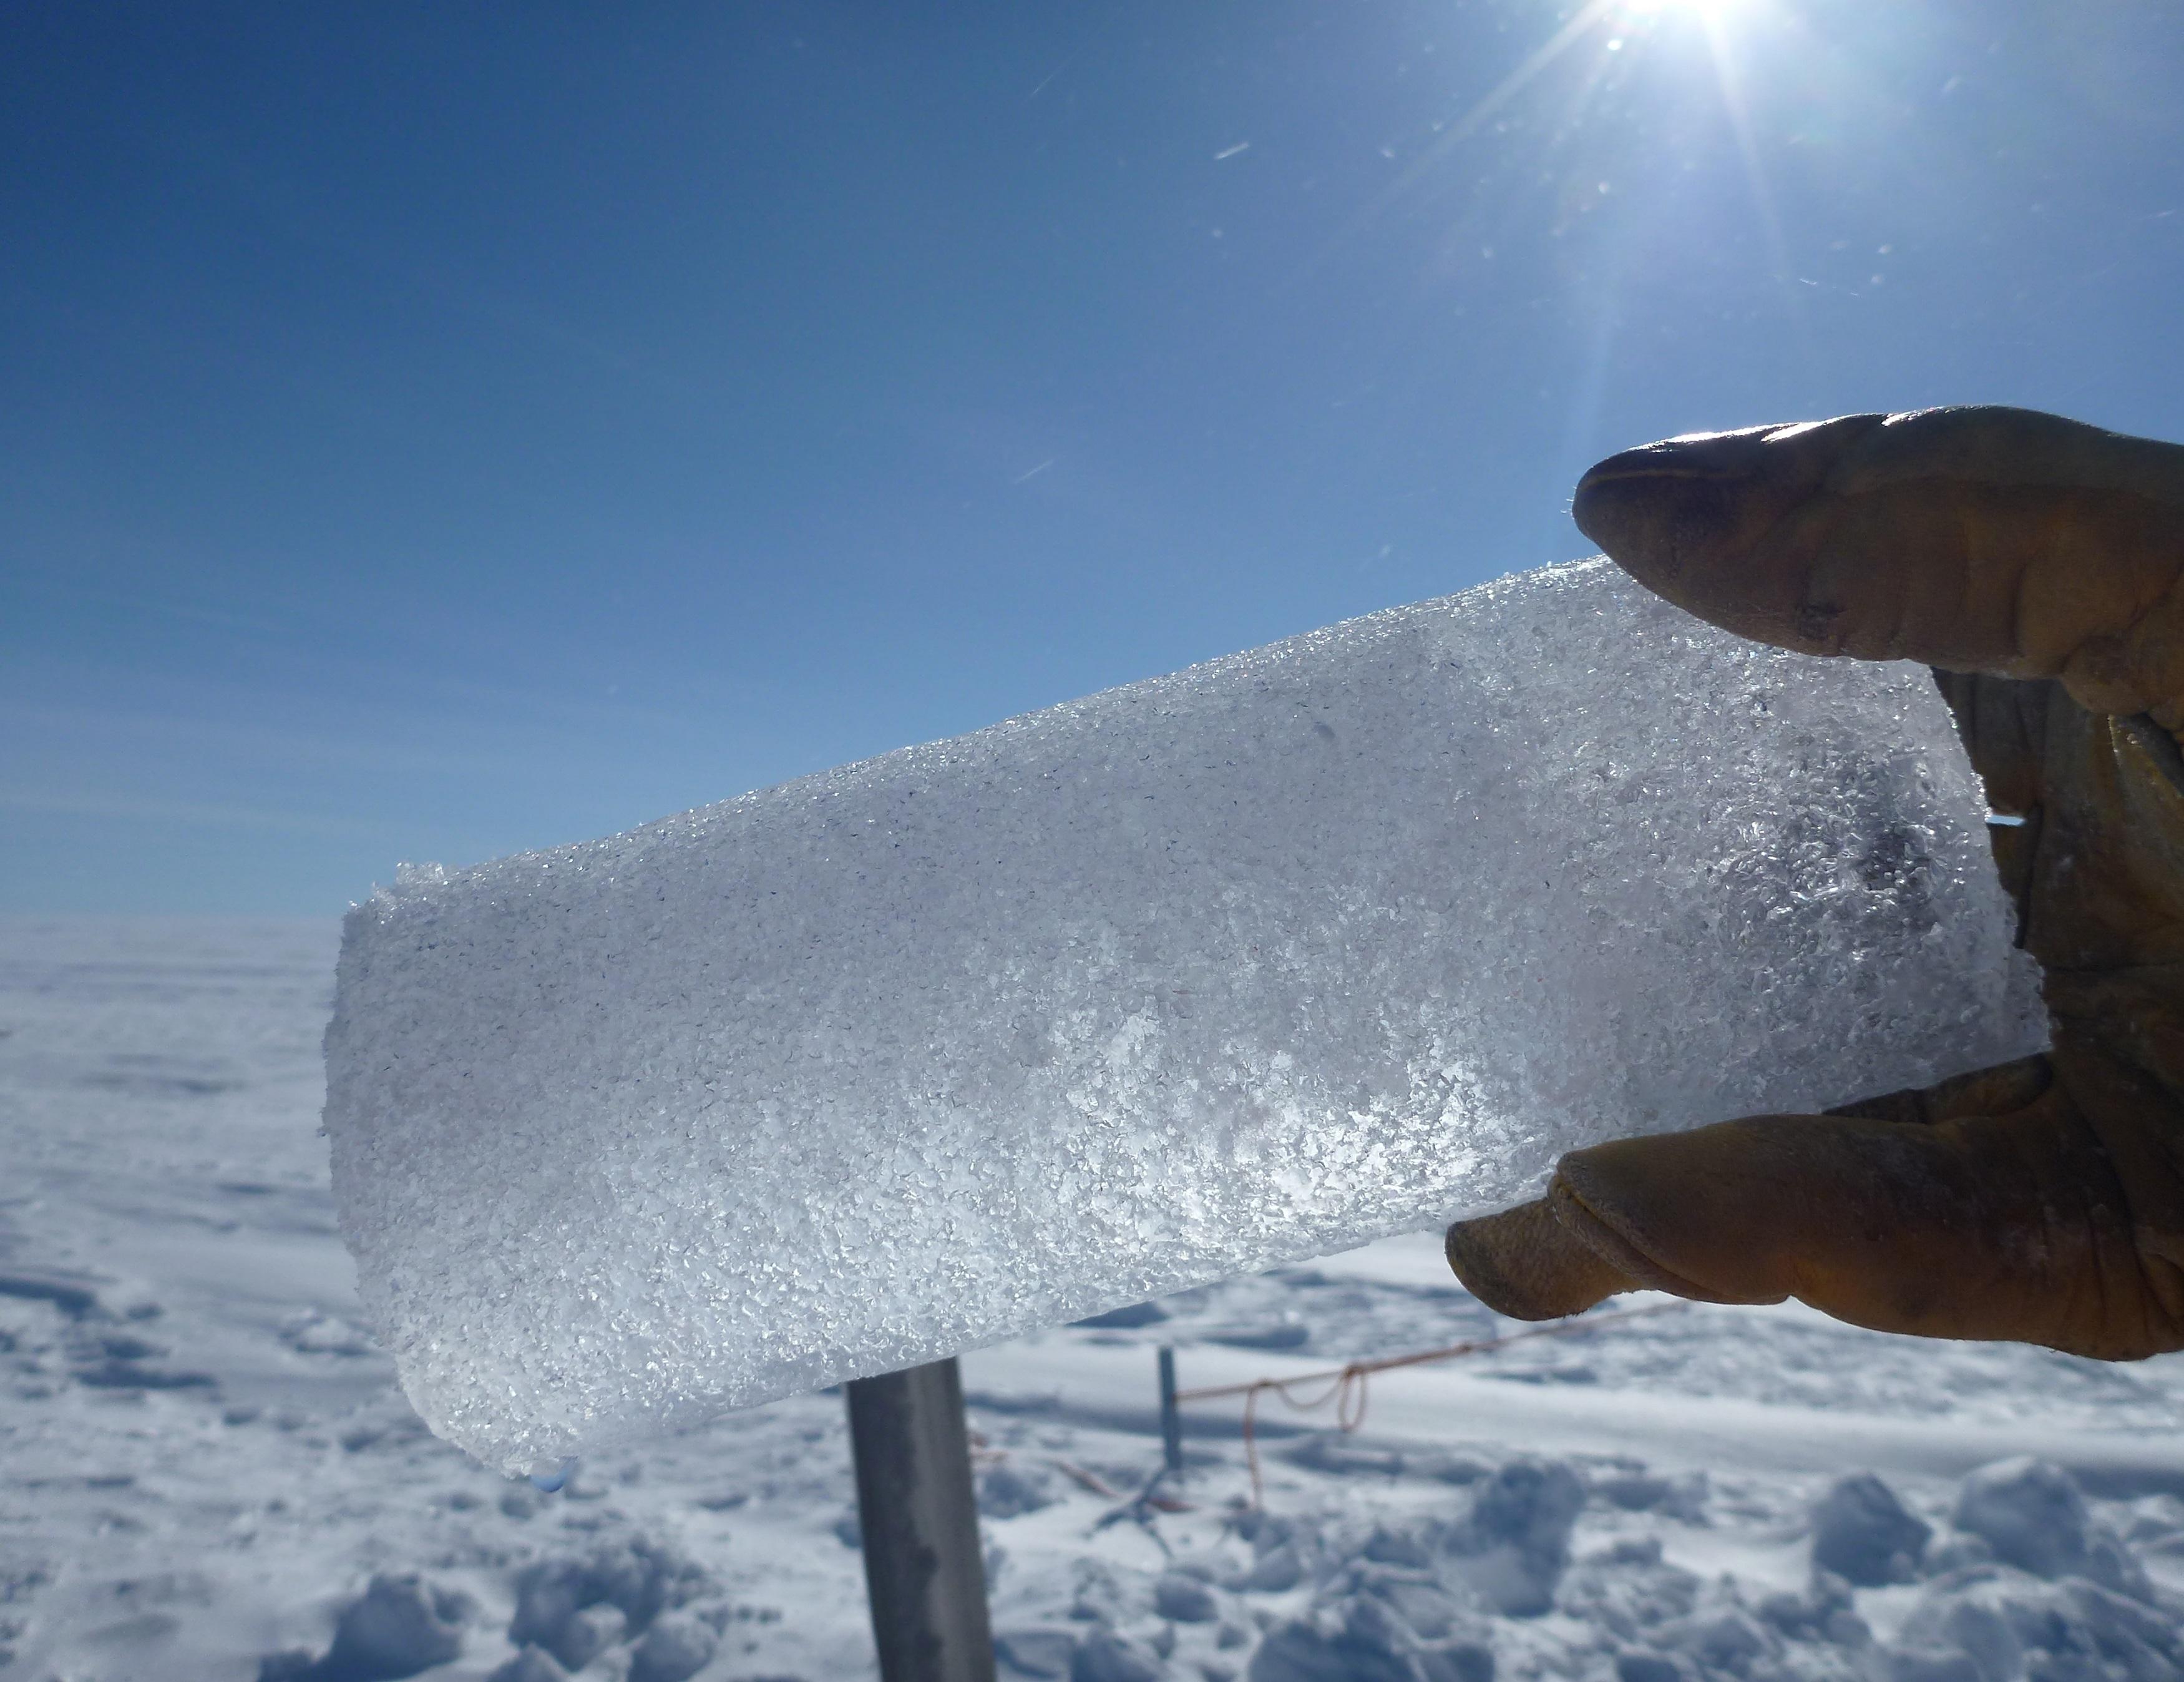 An ice core segment extracted in Antarctica